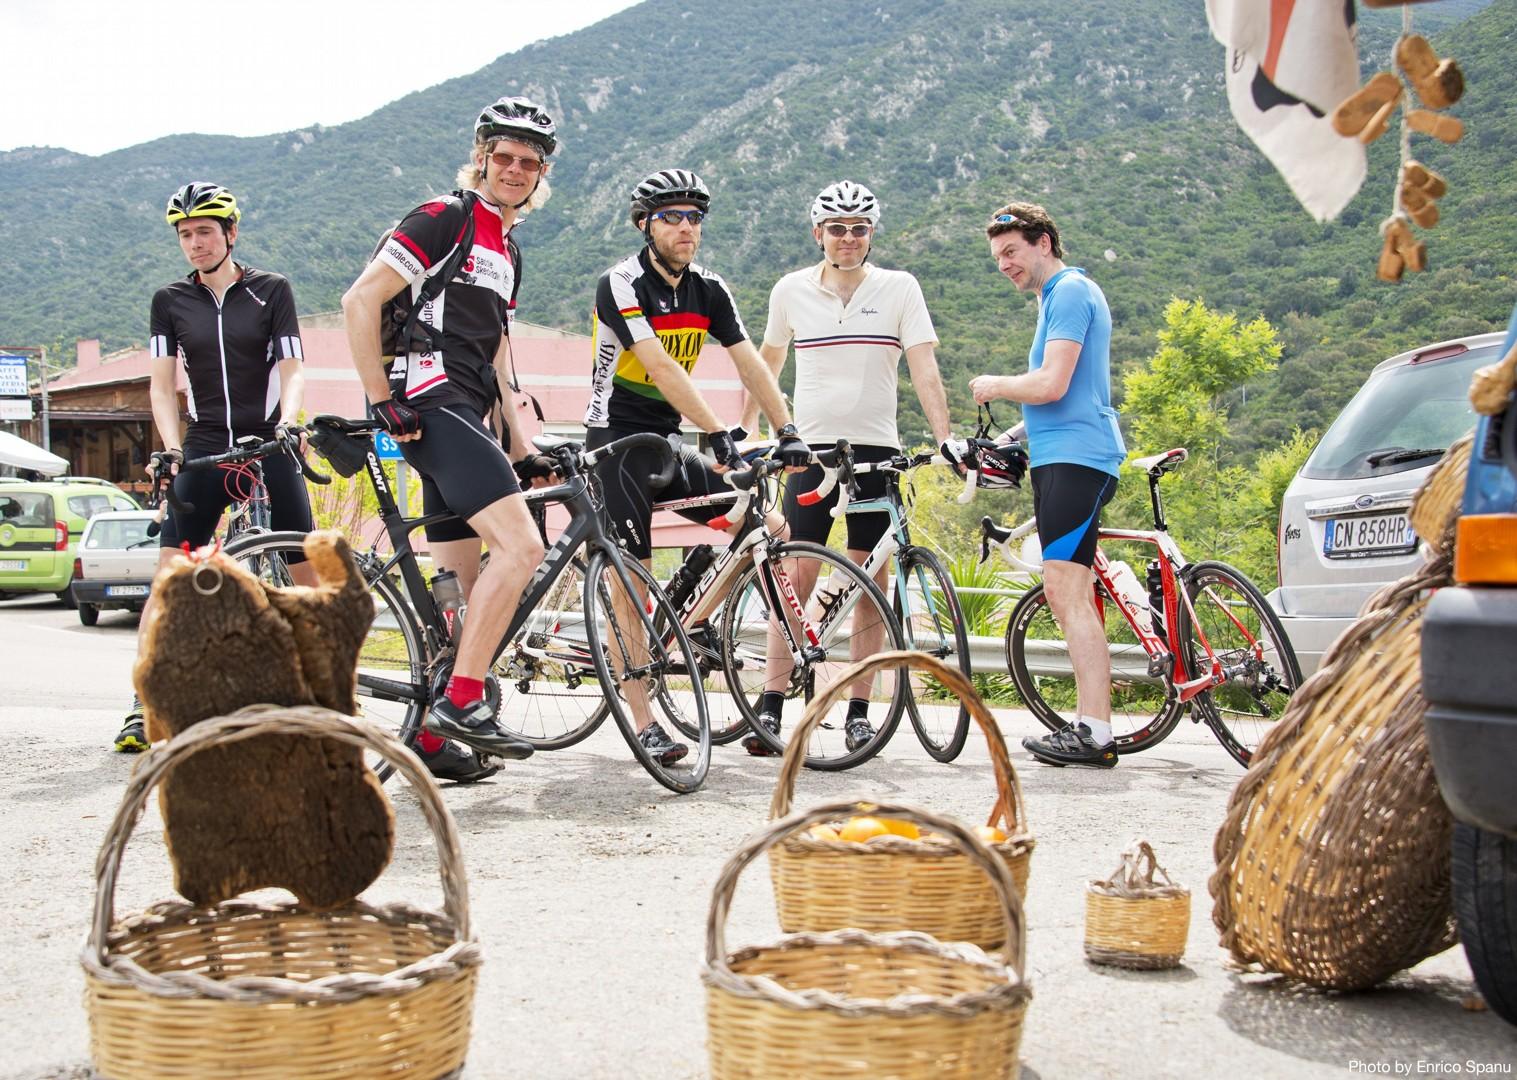 Guided-Road-Cycling-Holiday-Sardinia-Sardinian-Mountains.jpg - Italy - Sardinia - Sardinian Mountains - Guided Road Cycling Holiday - Road Cycling